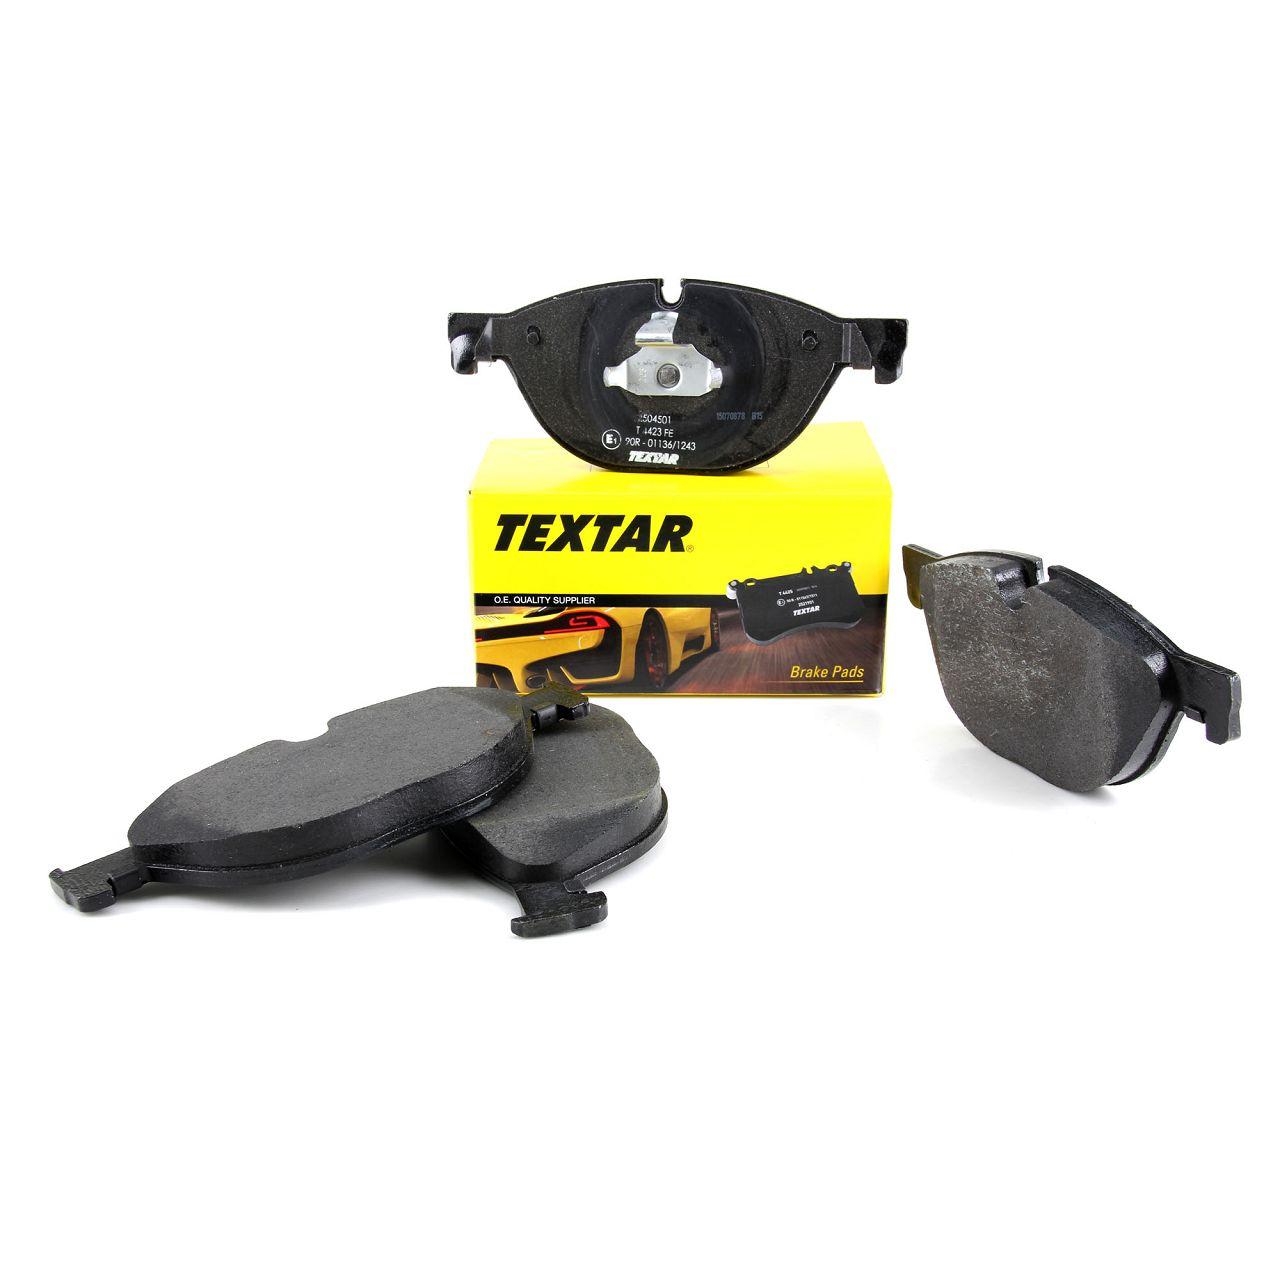 TEXTAR 2504501 Bremsbeläge BMW 5er F10 F11 F07 6er F12 F13 F06 7er F01 vorne 34116851269